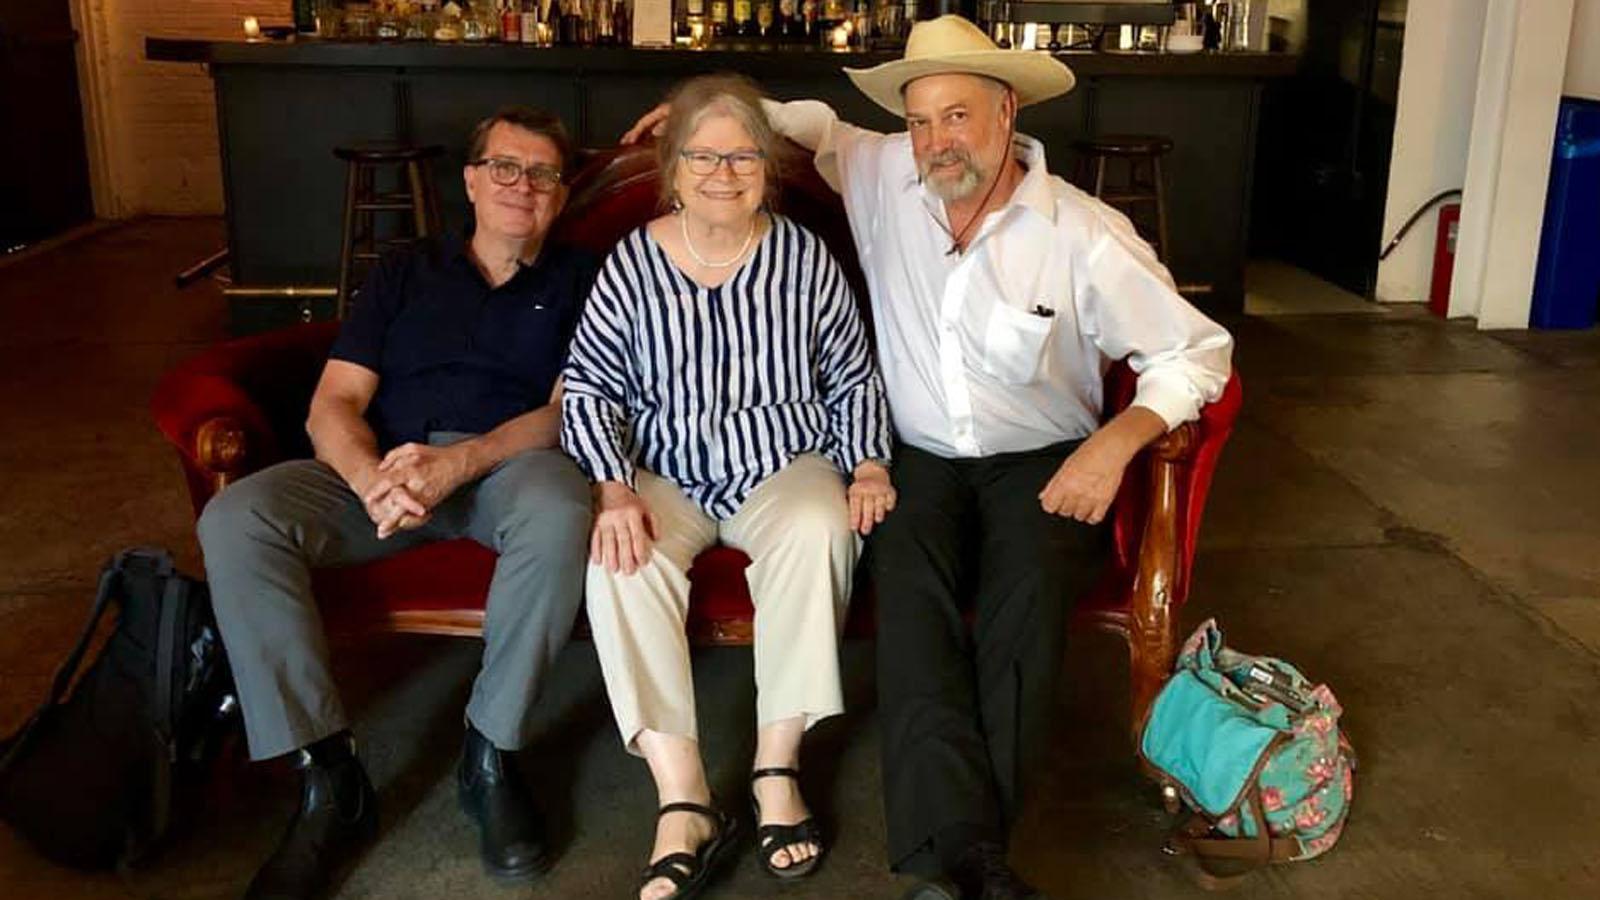 Jim Browne, Maureen Gosling, and Harrod Blank in the Metrograph lobby, June 2019.